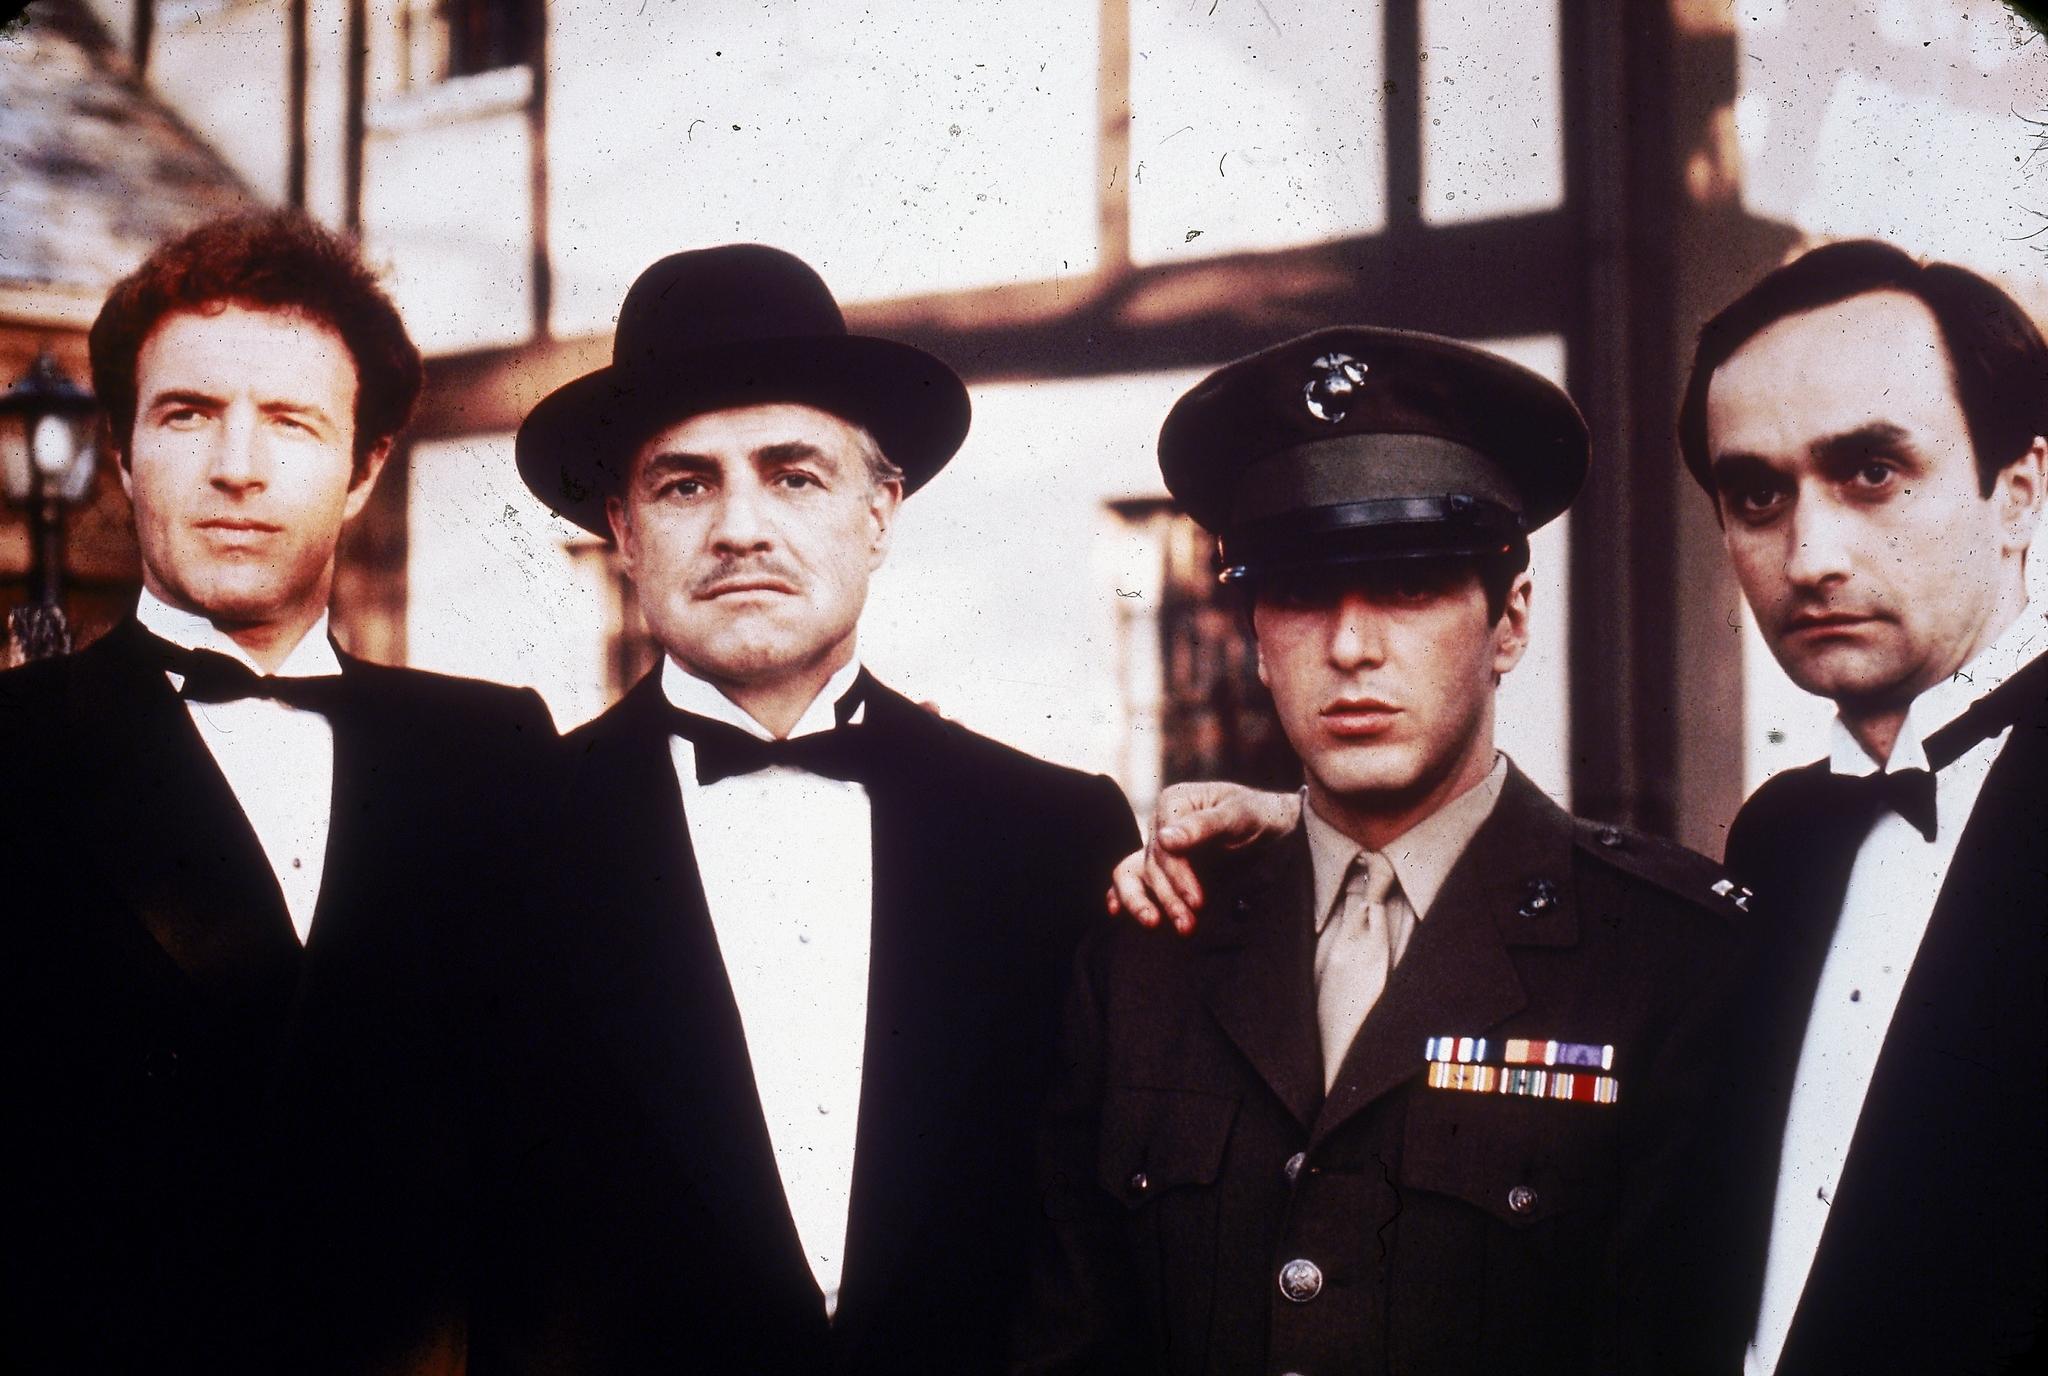 Marlon Brando, Al Pacino, James Caan, and John Cazale in The Godfather (1972)